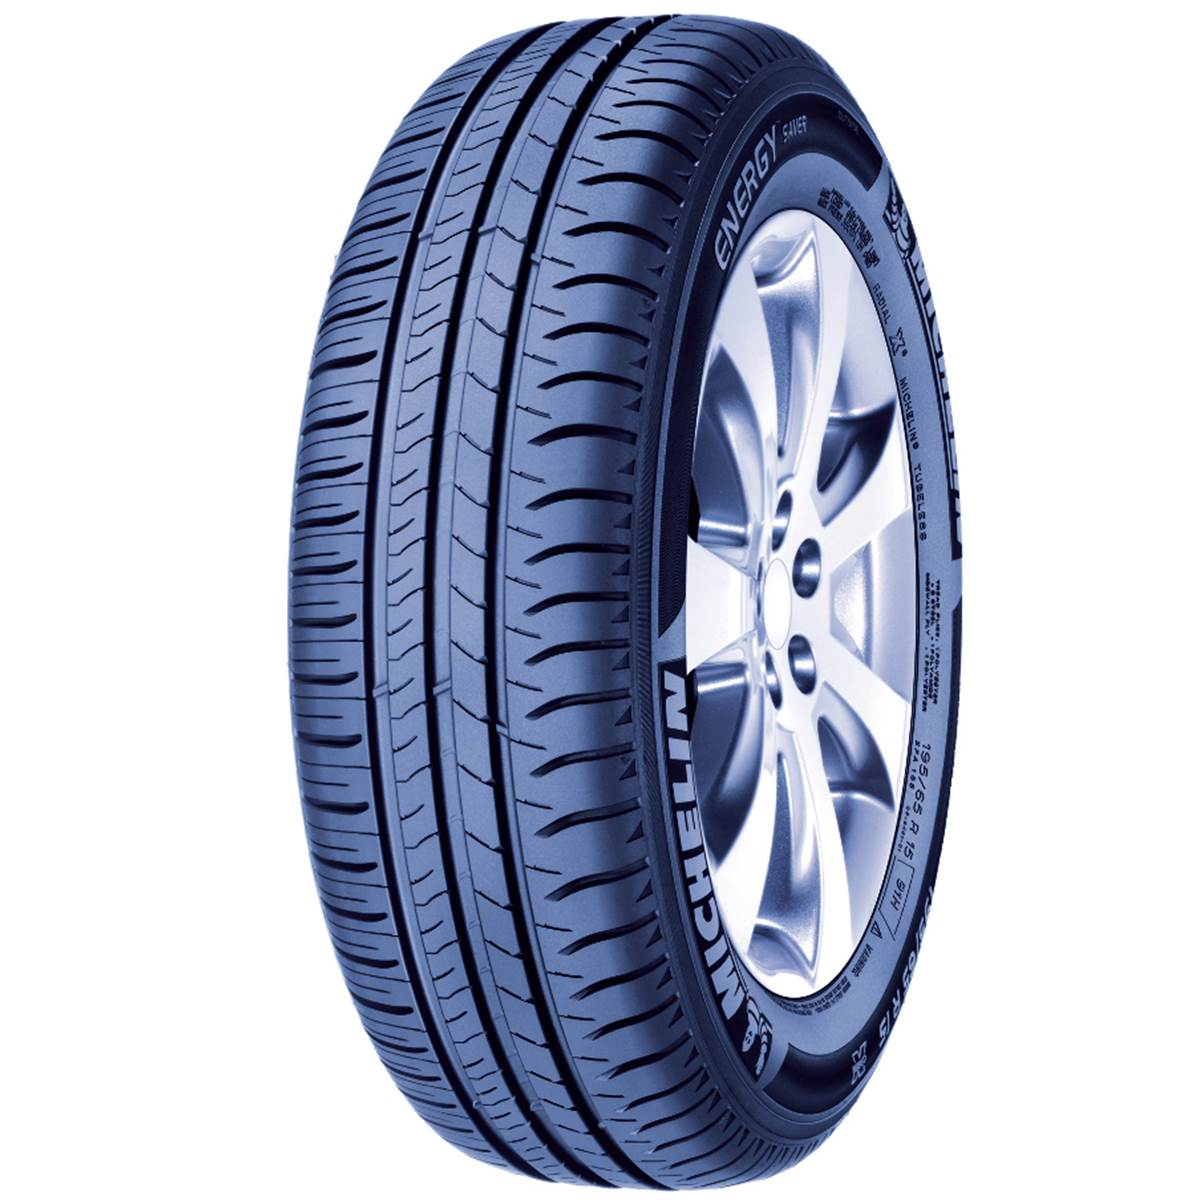 Pneu Michelin 185/60R15 84H ENERGY SAVER